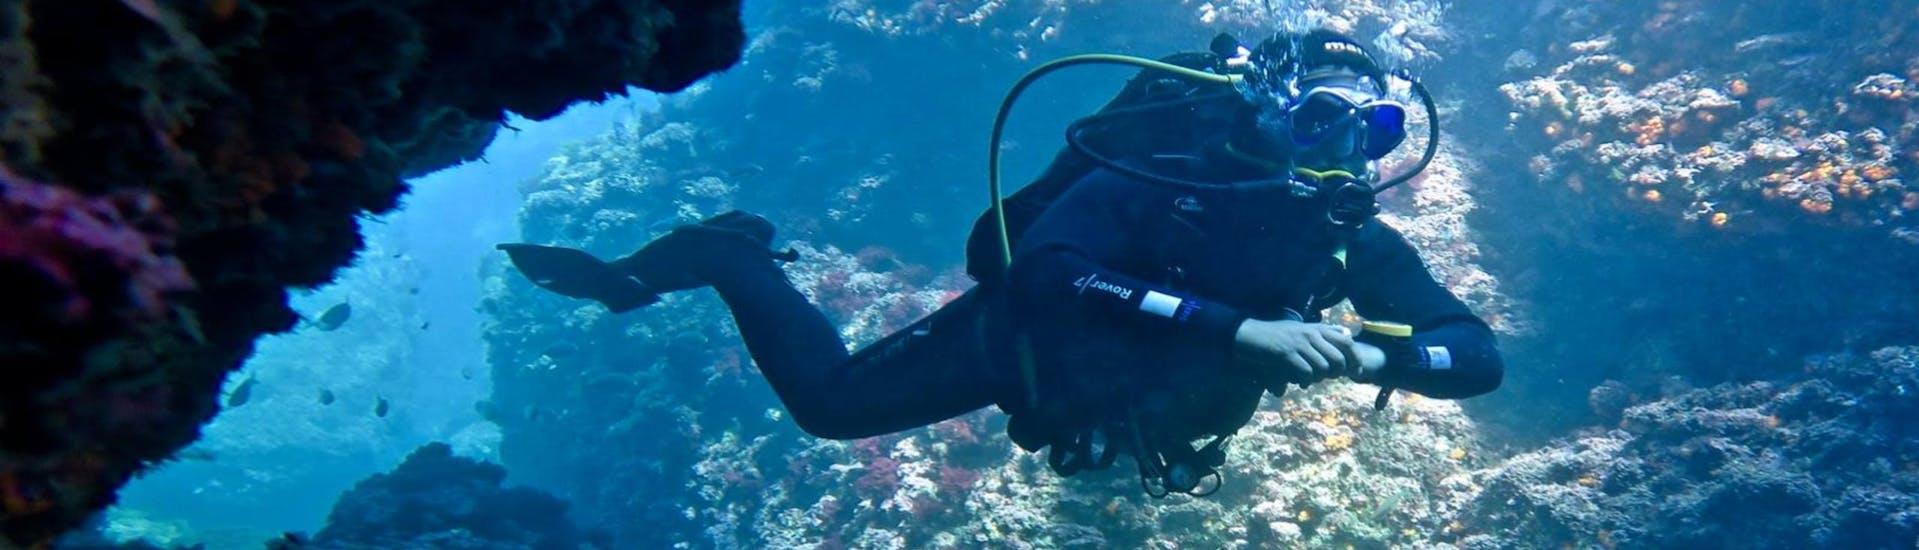 scuba-diving-course-advanced-adventure-course-leon-marina-tarifa-hero